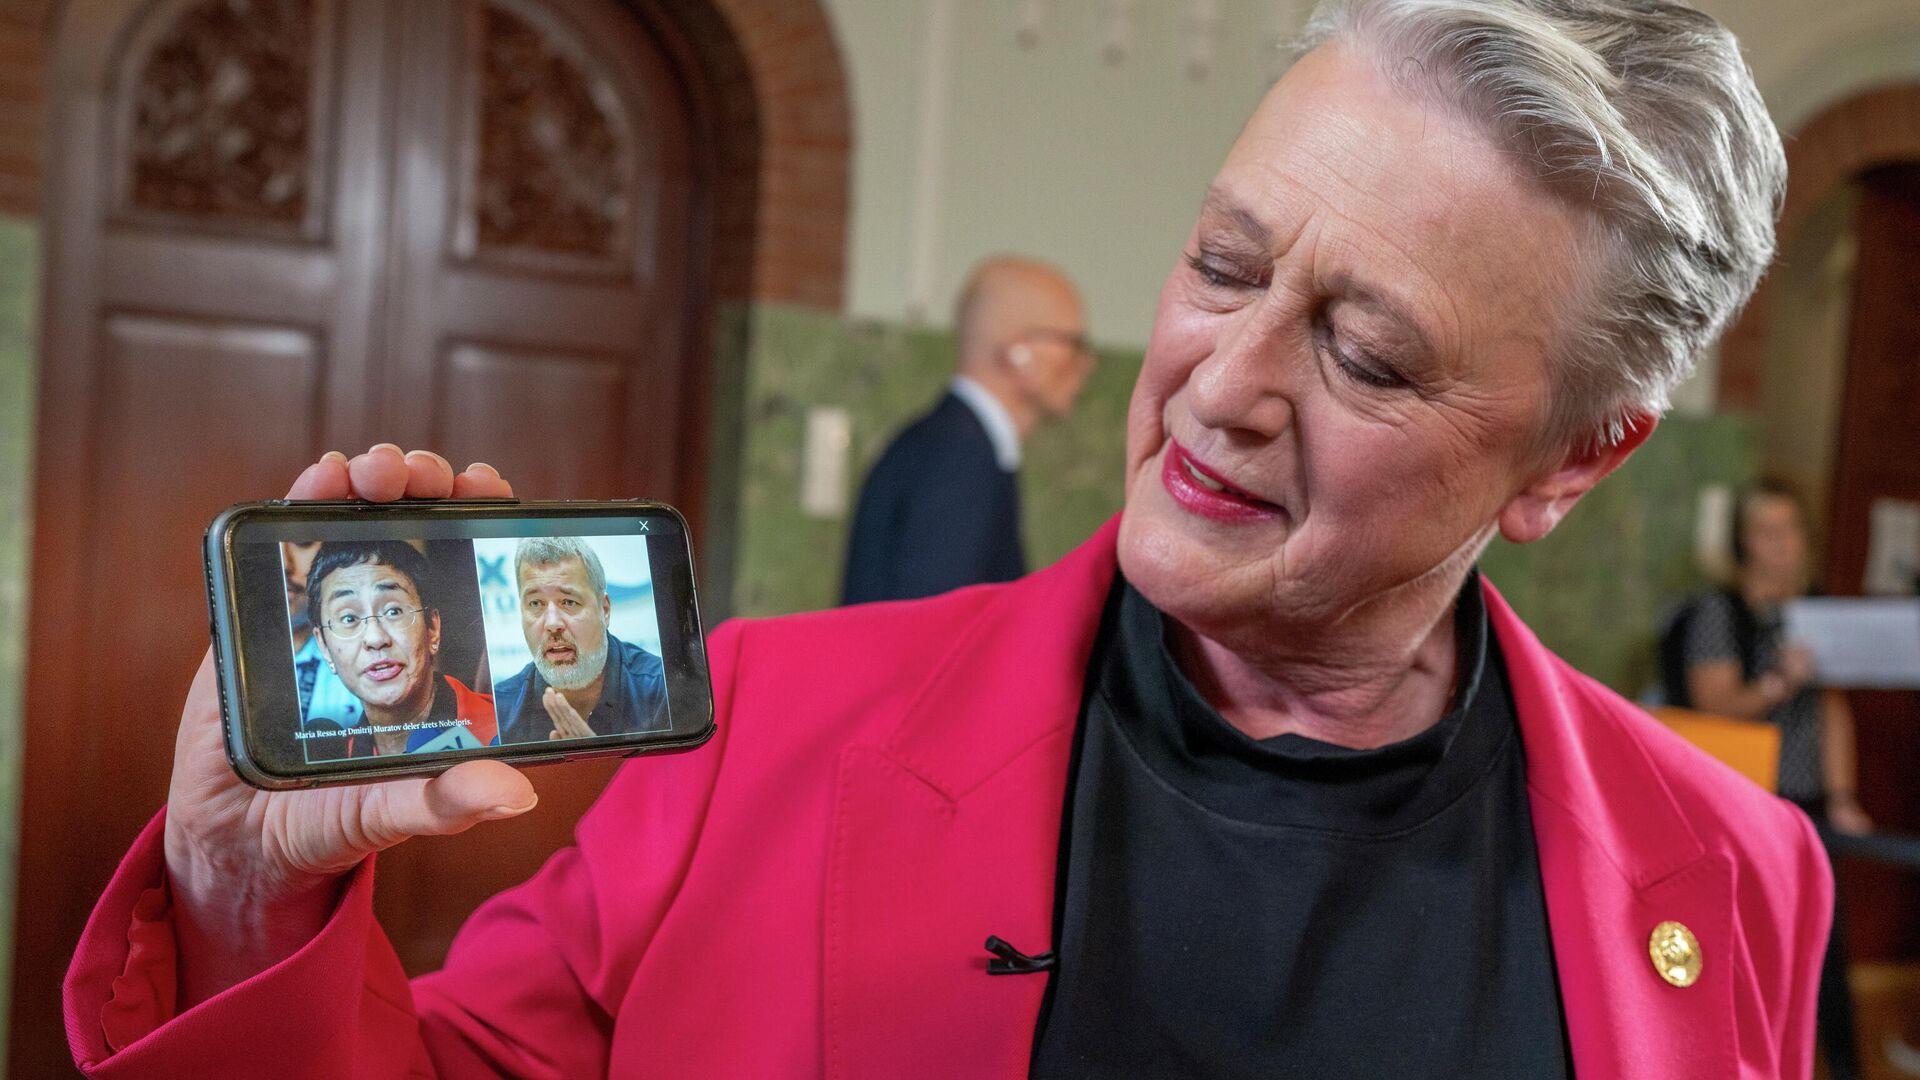 Vorsitzende des Nobelkomitees, Berit Reiss-Andersen, zeigt Friedensnobelpreisträger - SNA, 1920, 08.10.2021